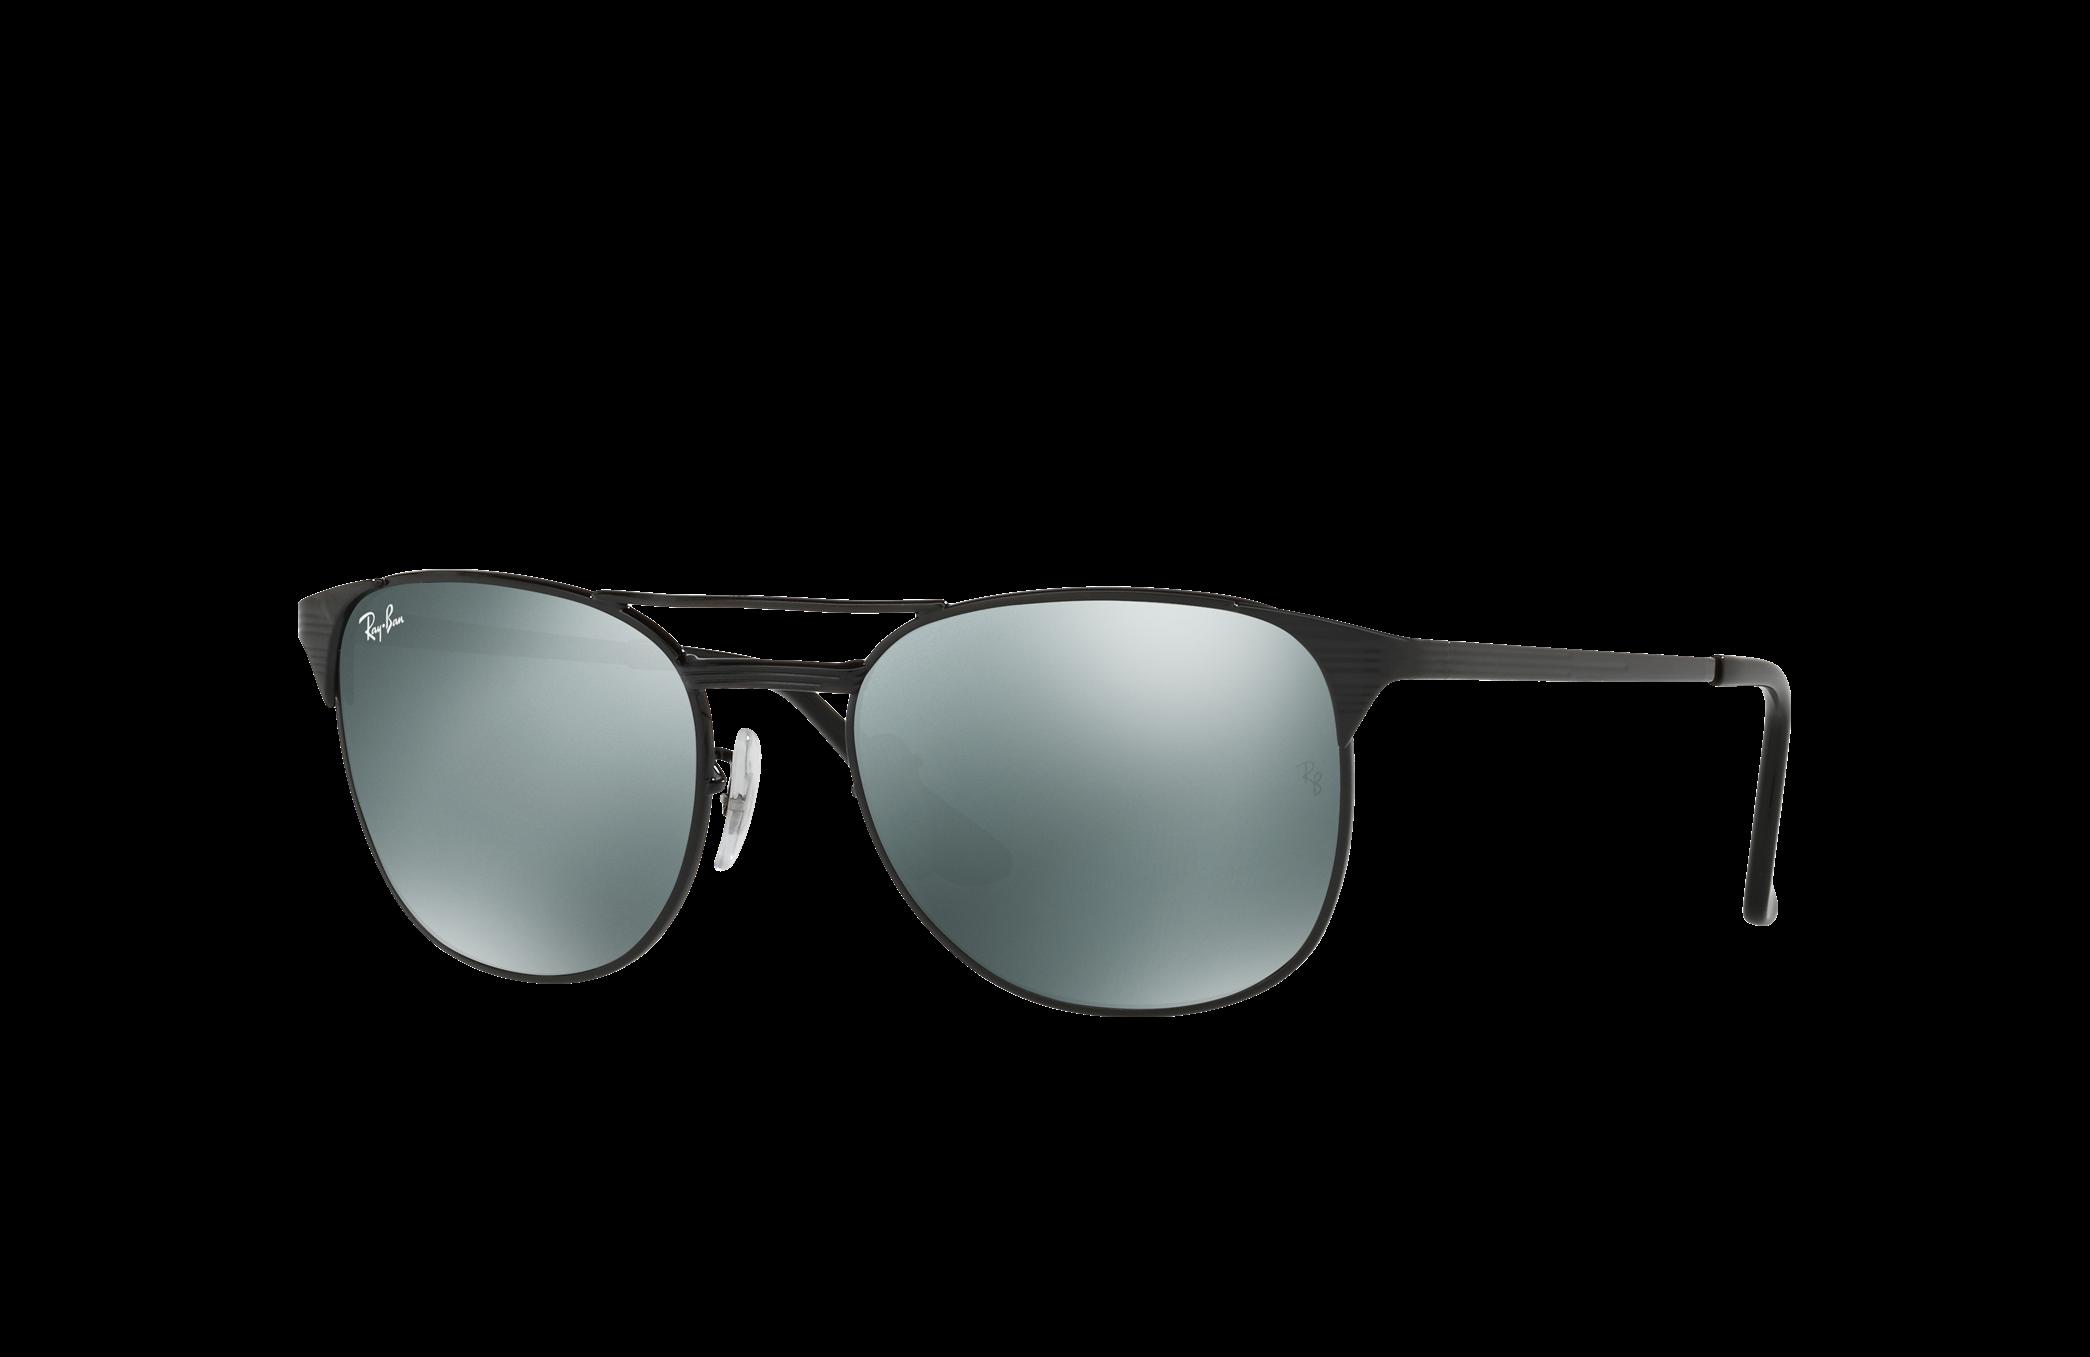 Ray-Ban Signet Black, Gray Lenses - RB3429M